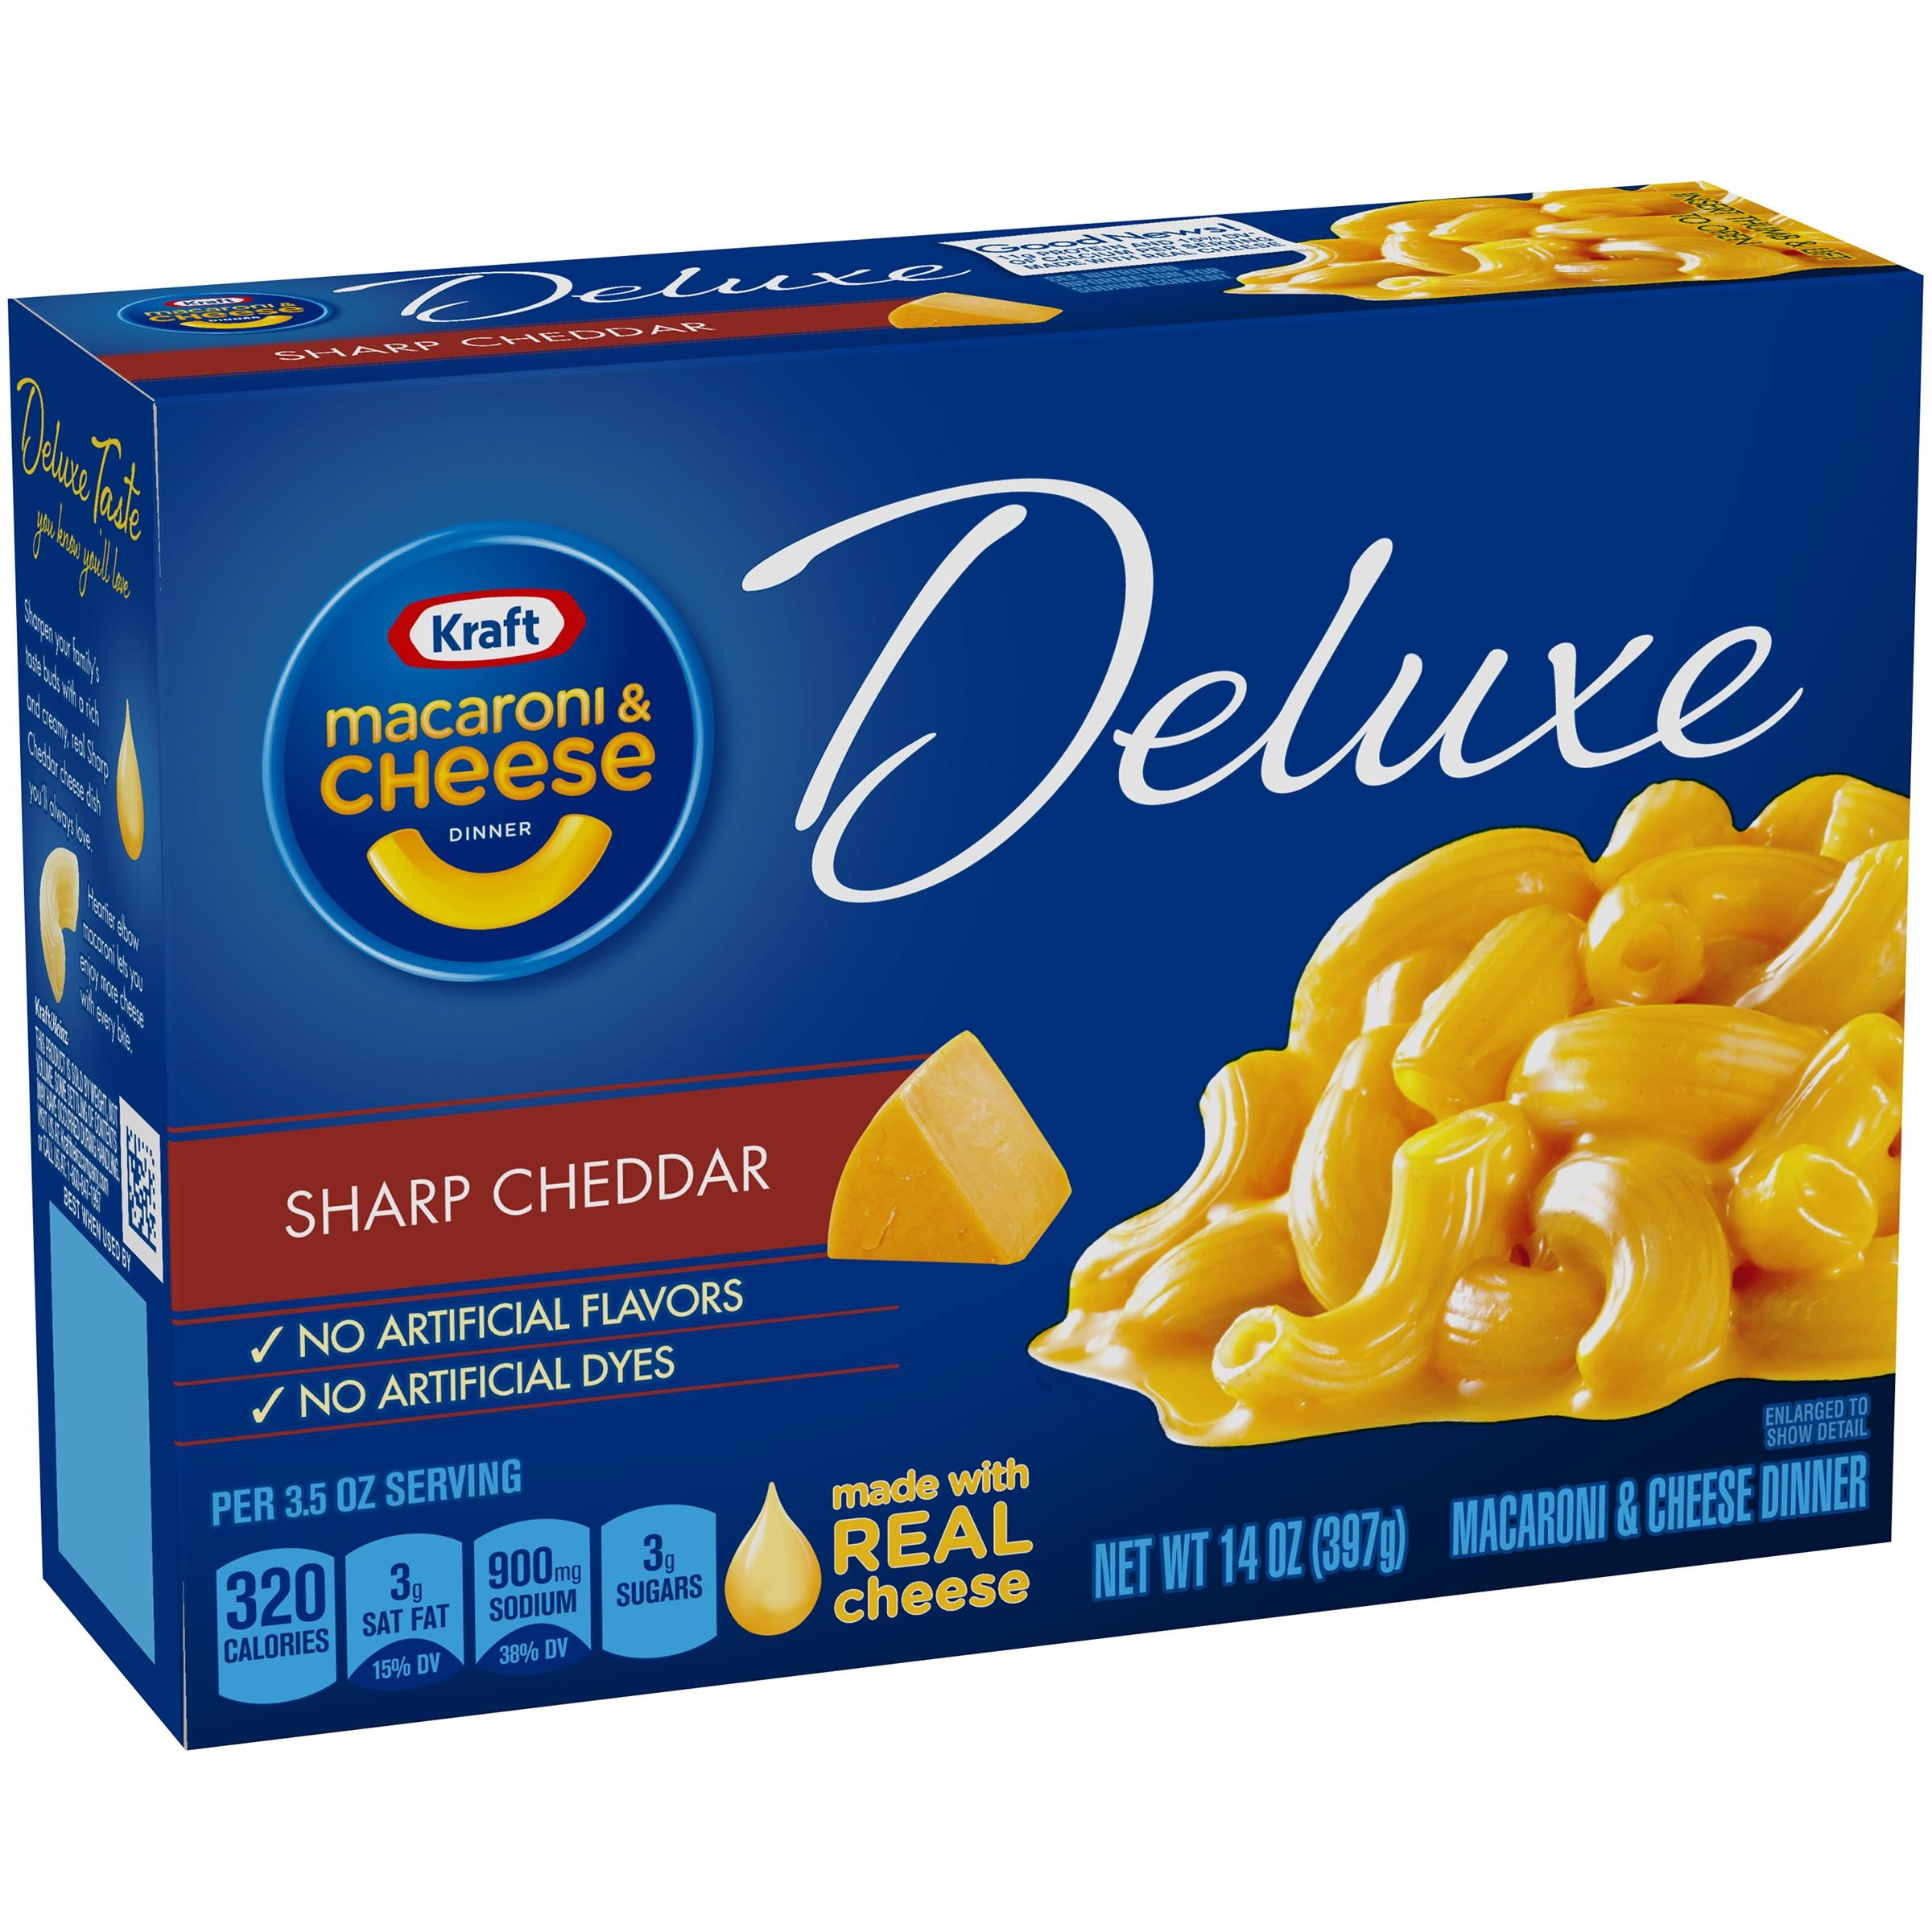 Kraft Macaroni & Cheese Deluxe Original Cheddar, 14.0 OZ